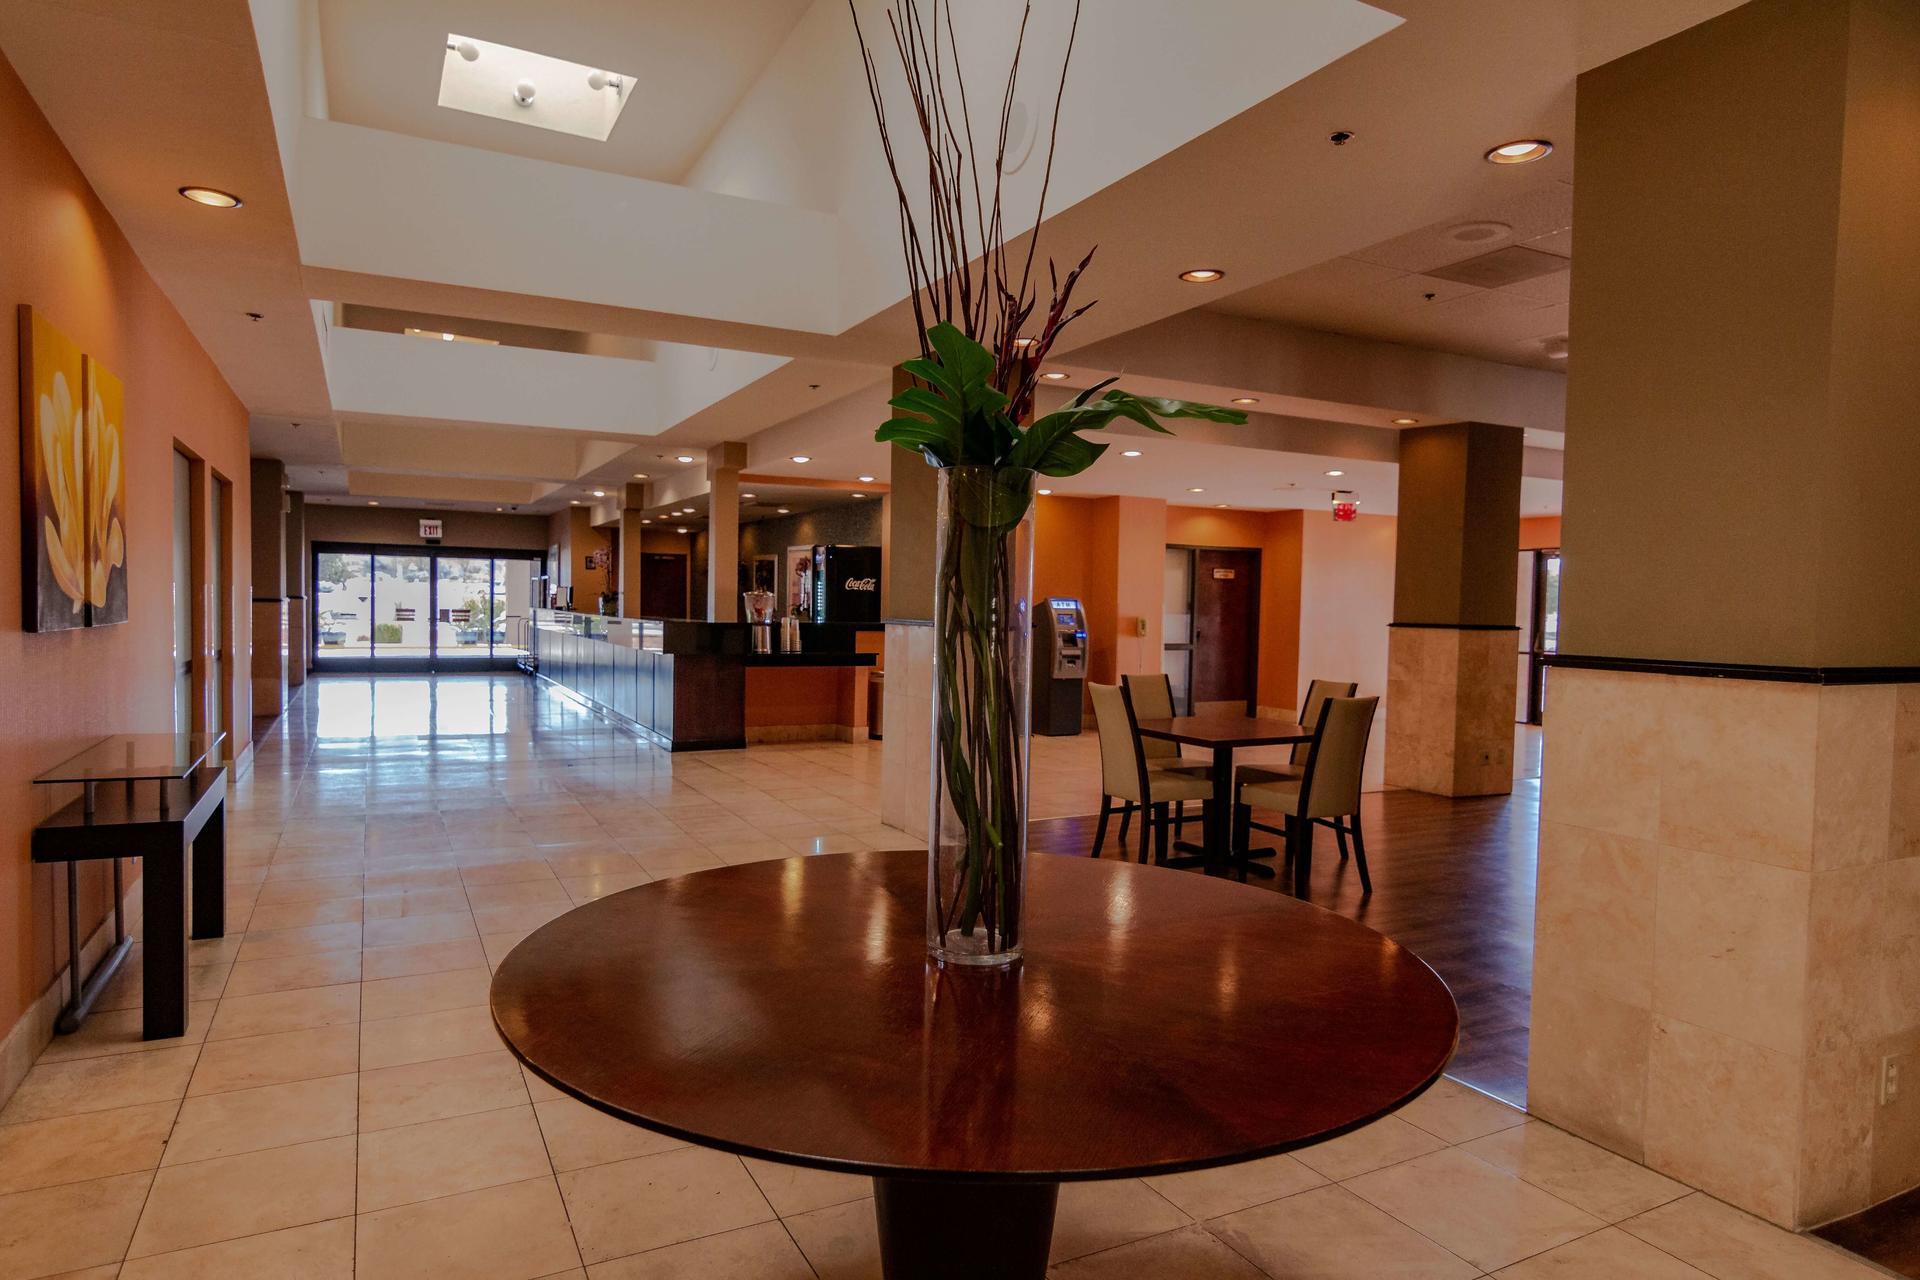 Lobby hall and reception area.